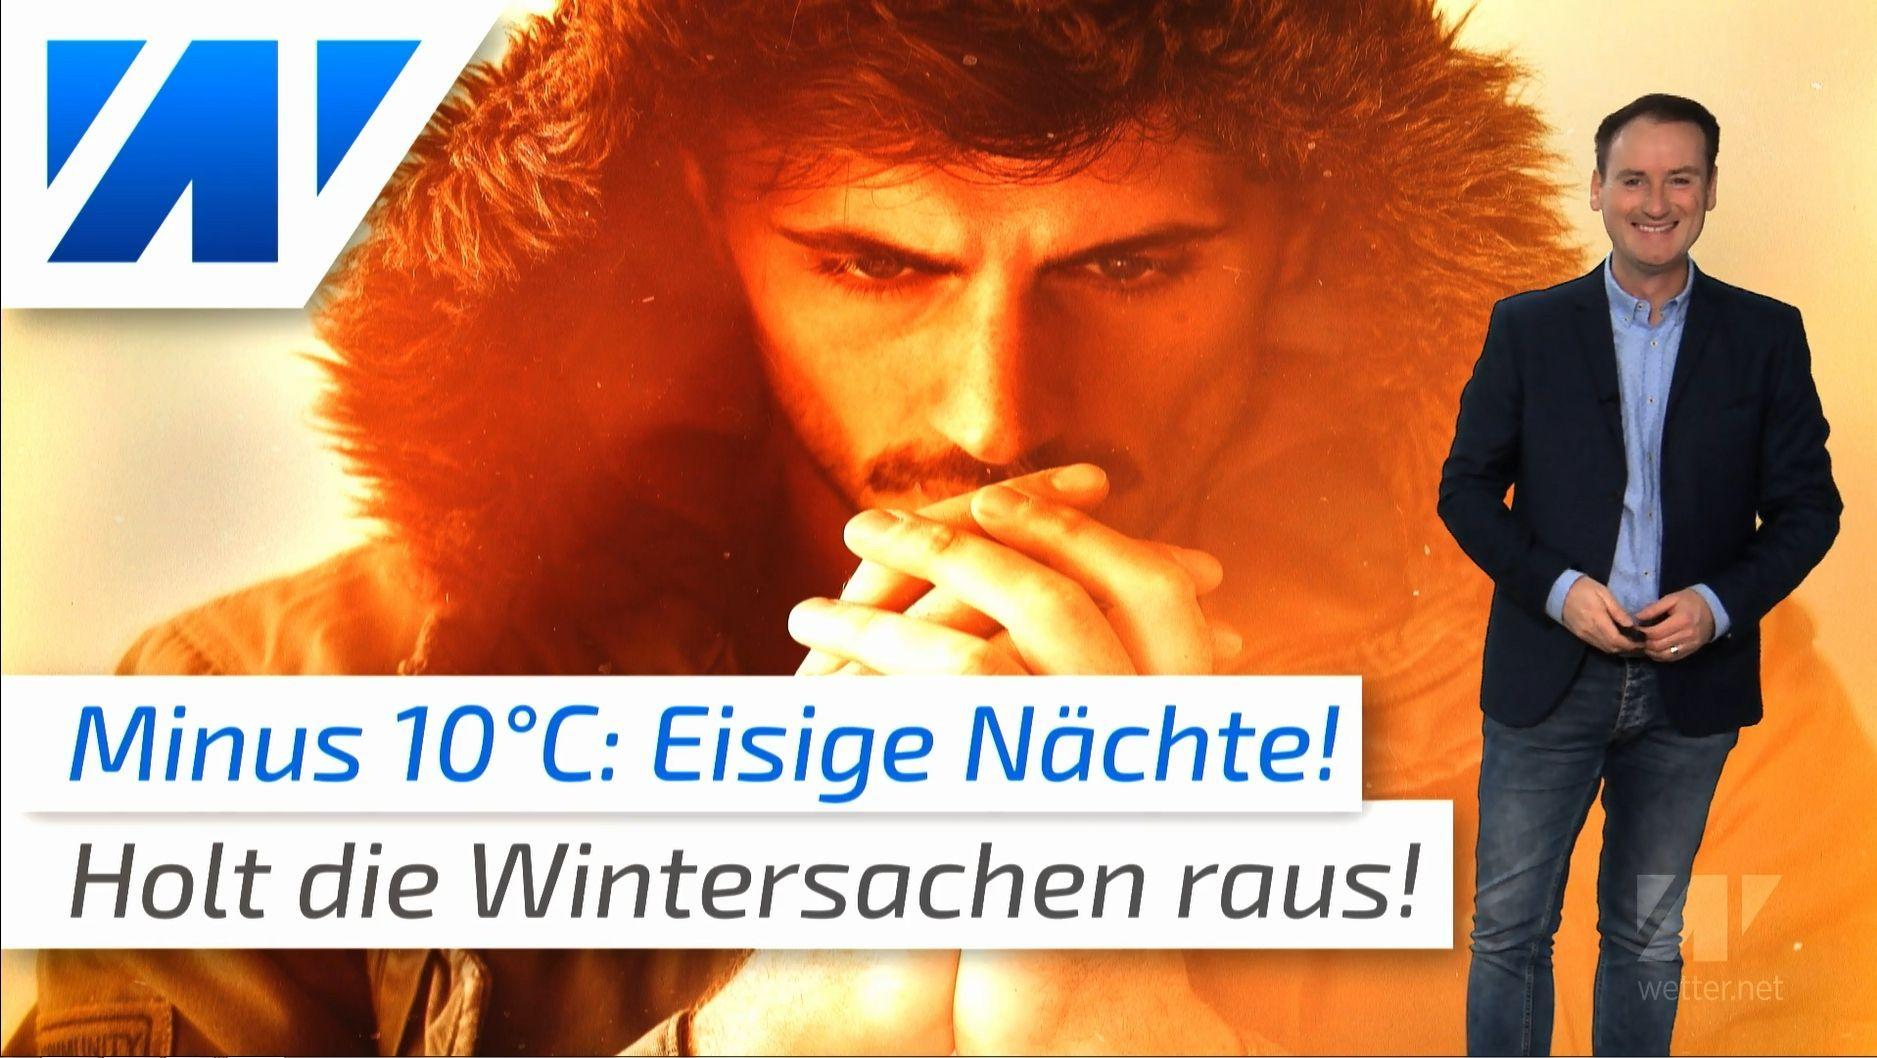 Temperatursturz! Minus 10 Grad: 35 Grad kälter als vergangene Woche!